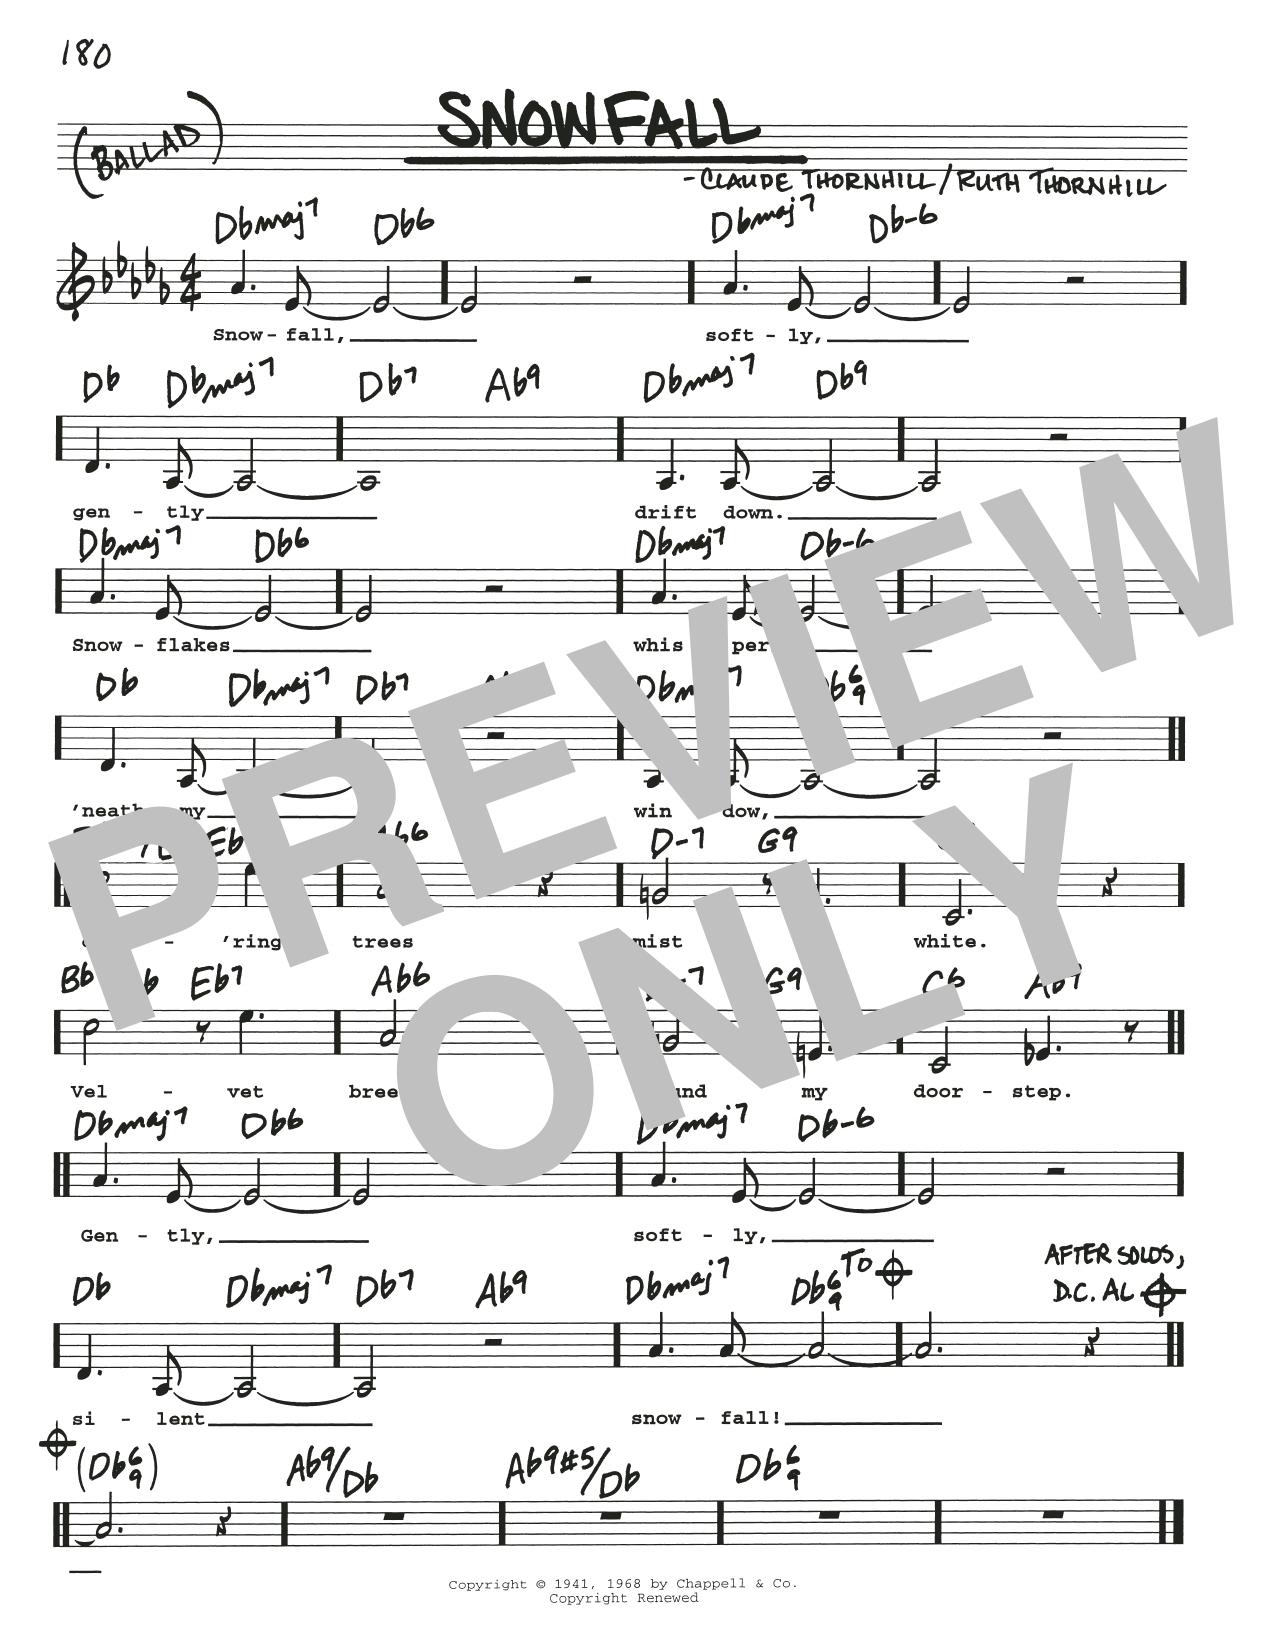 Snowfall Sheet Music